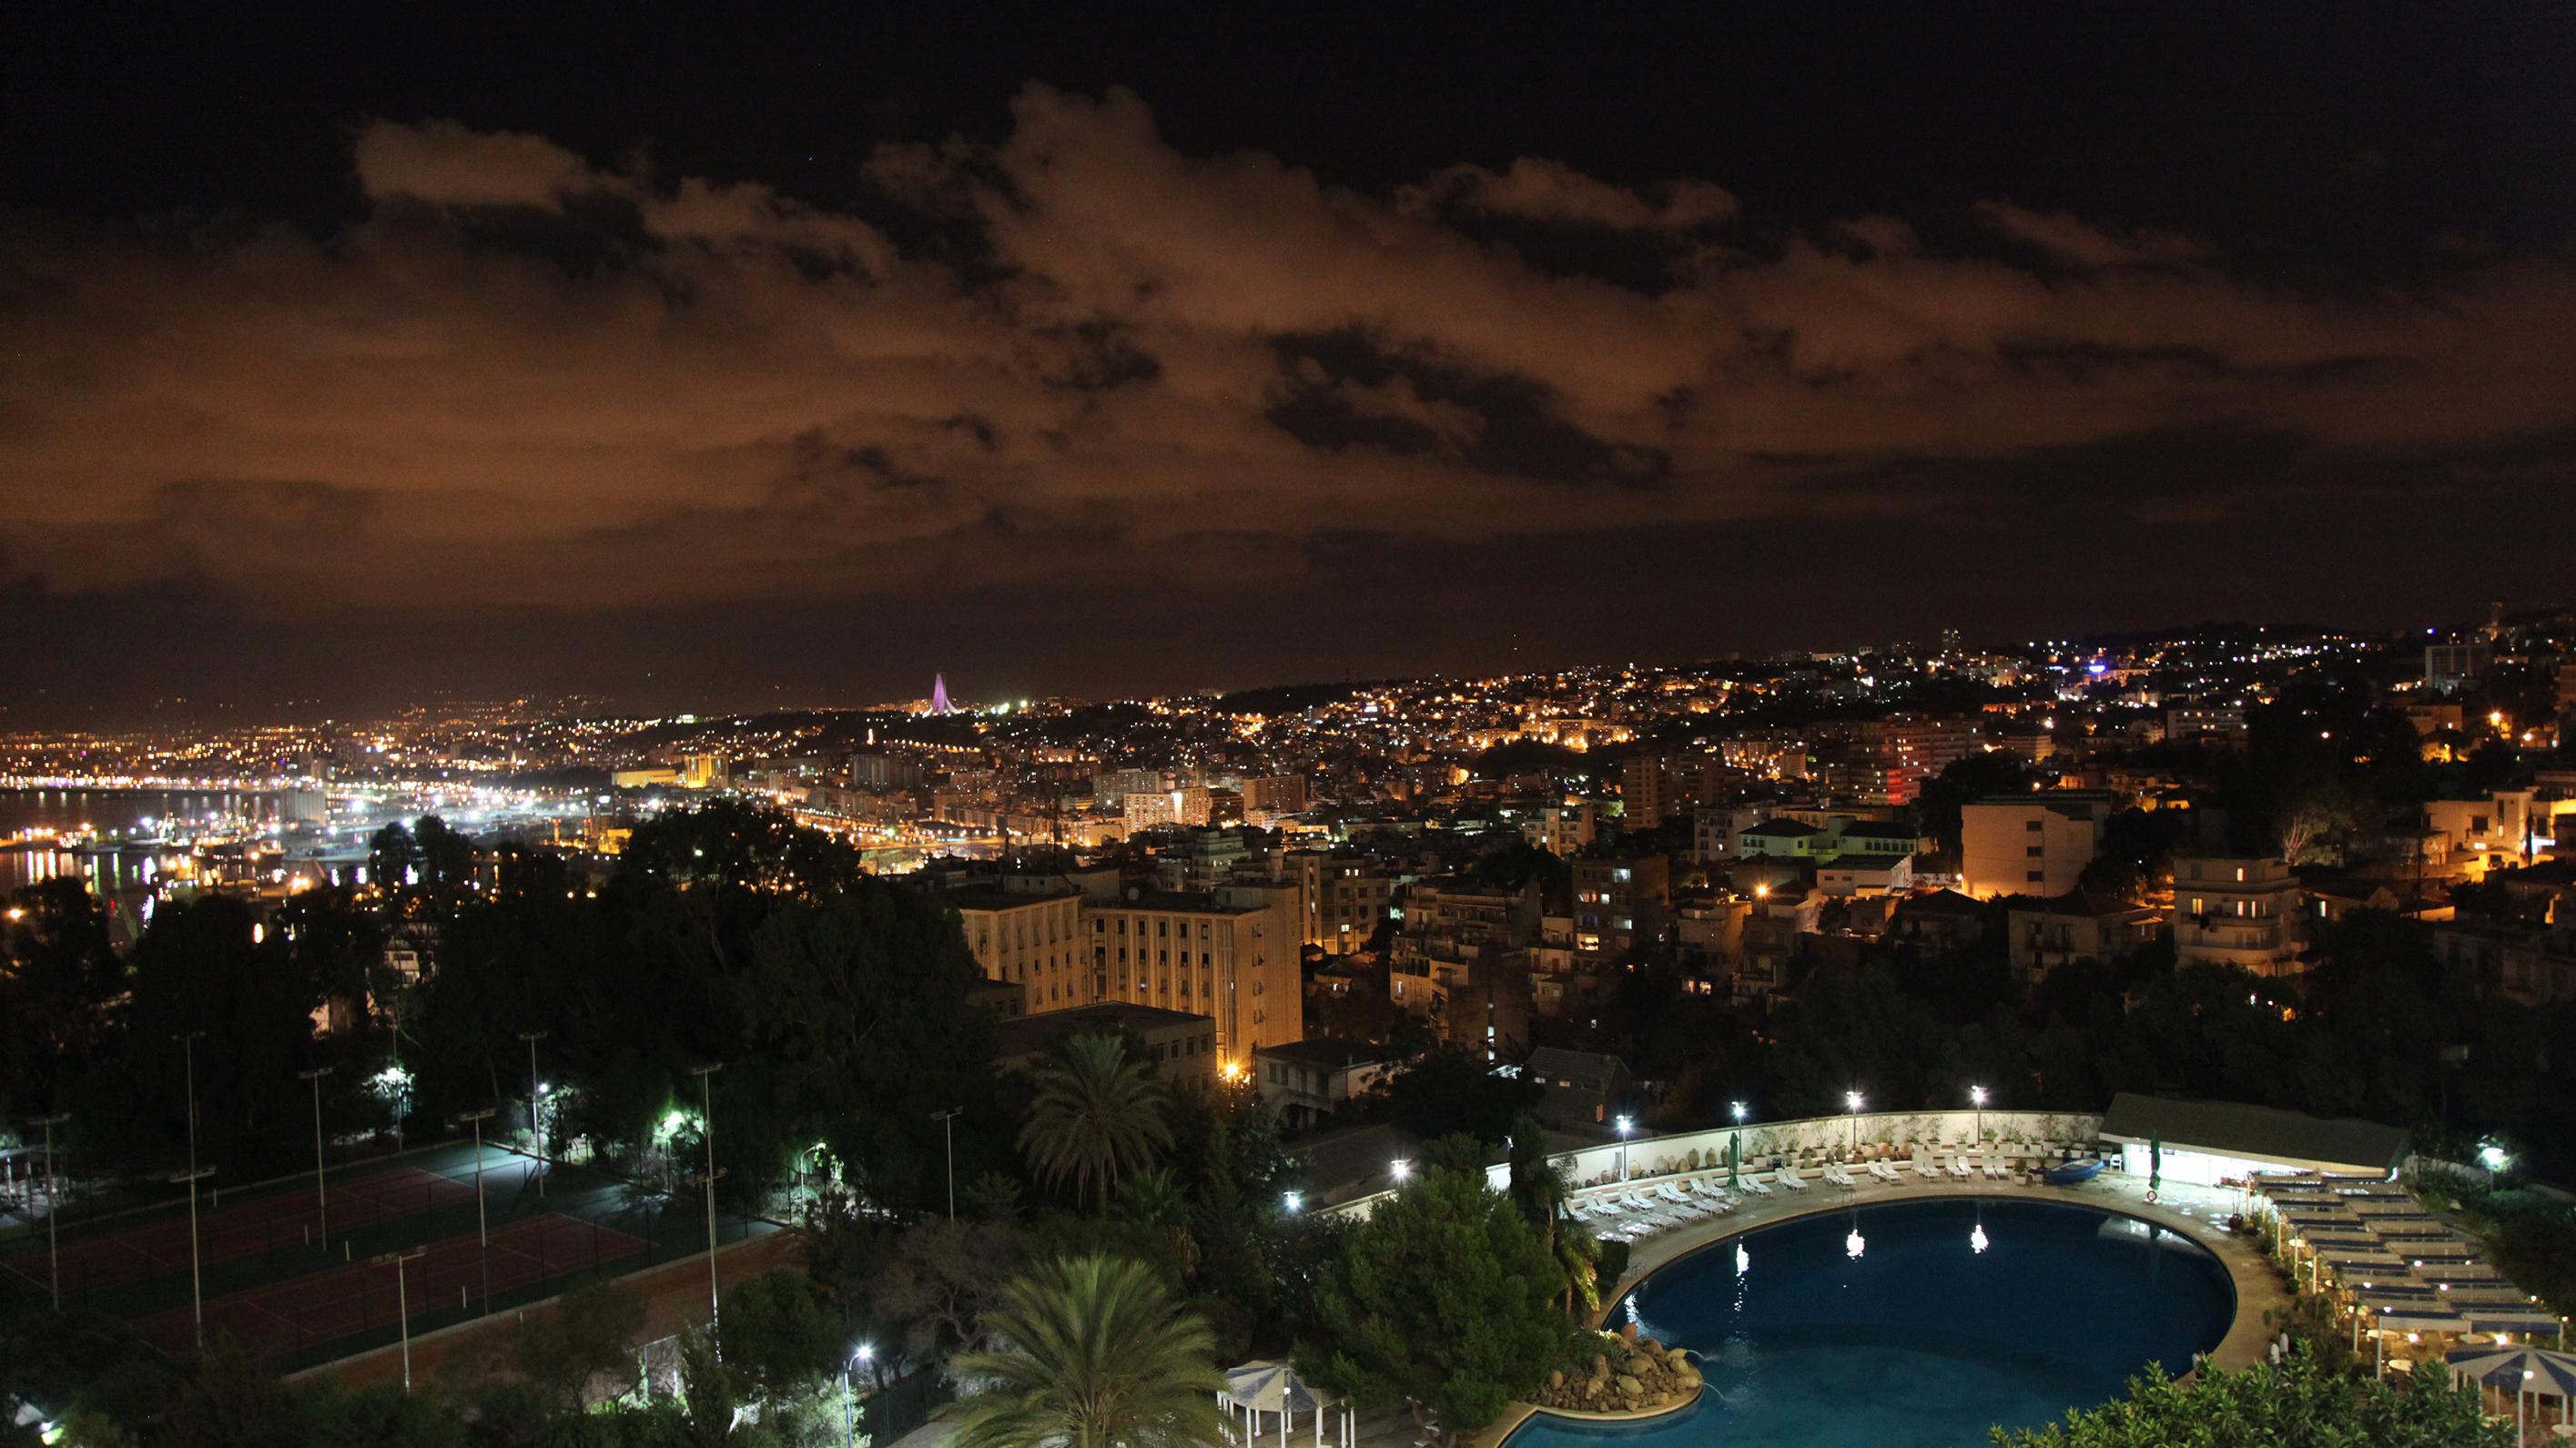 Alger-nuit-bis-1512303922.jpg